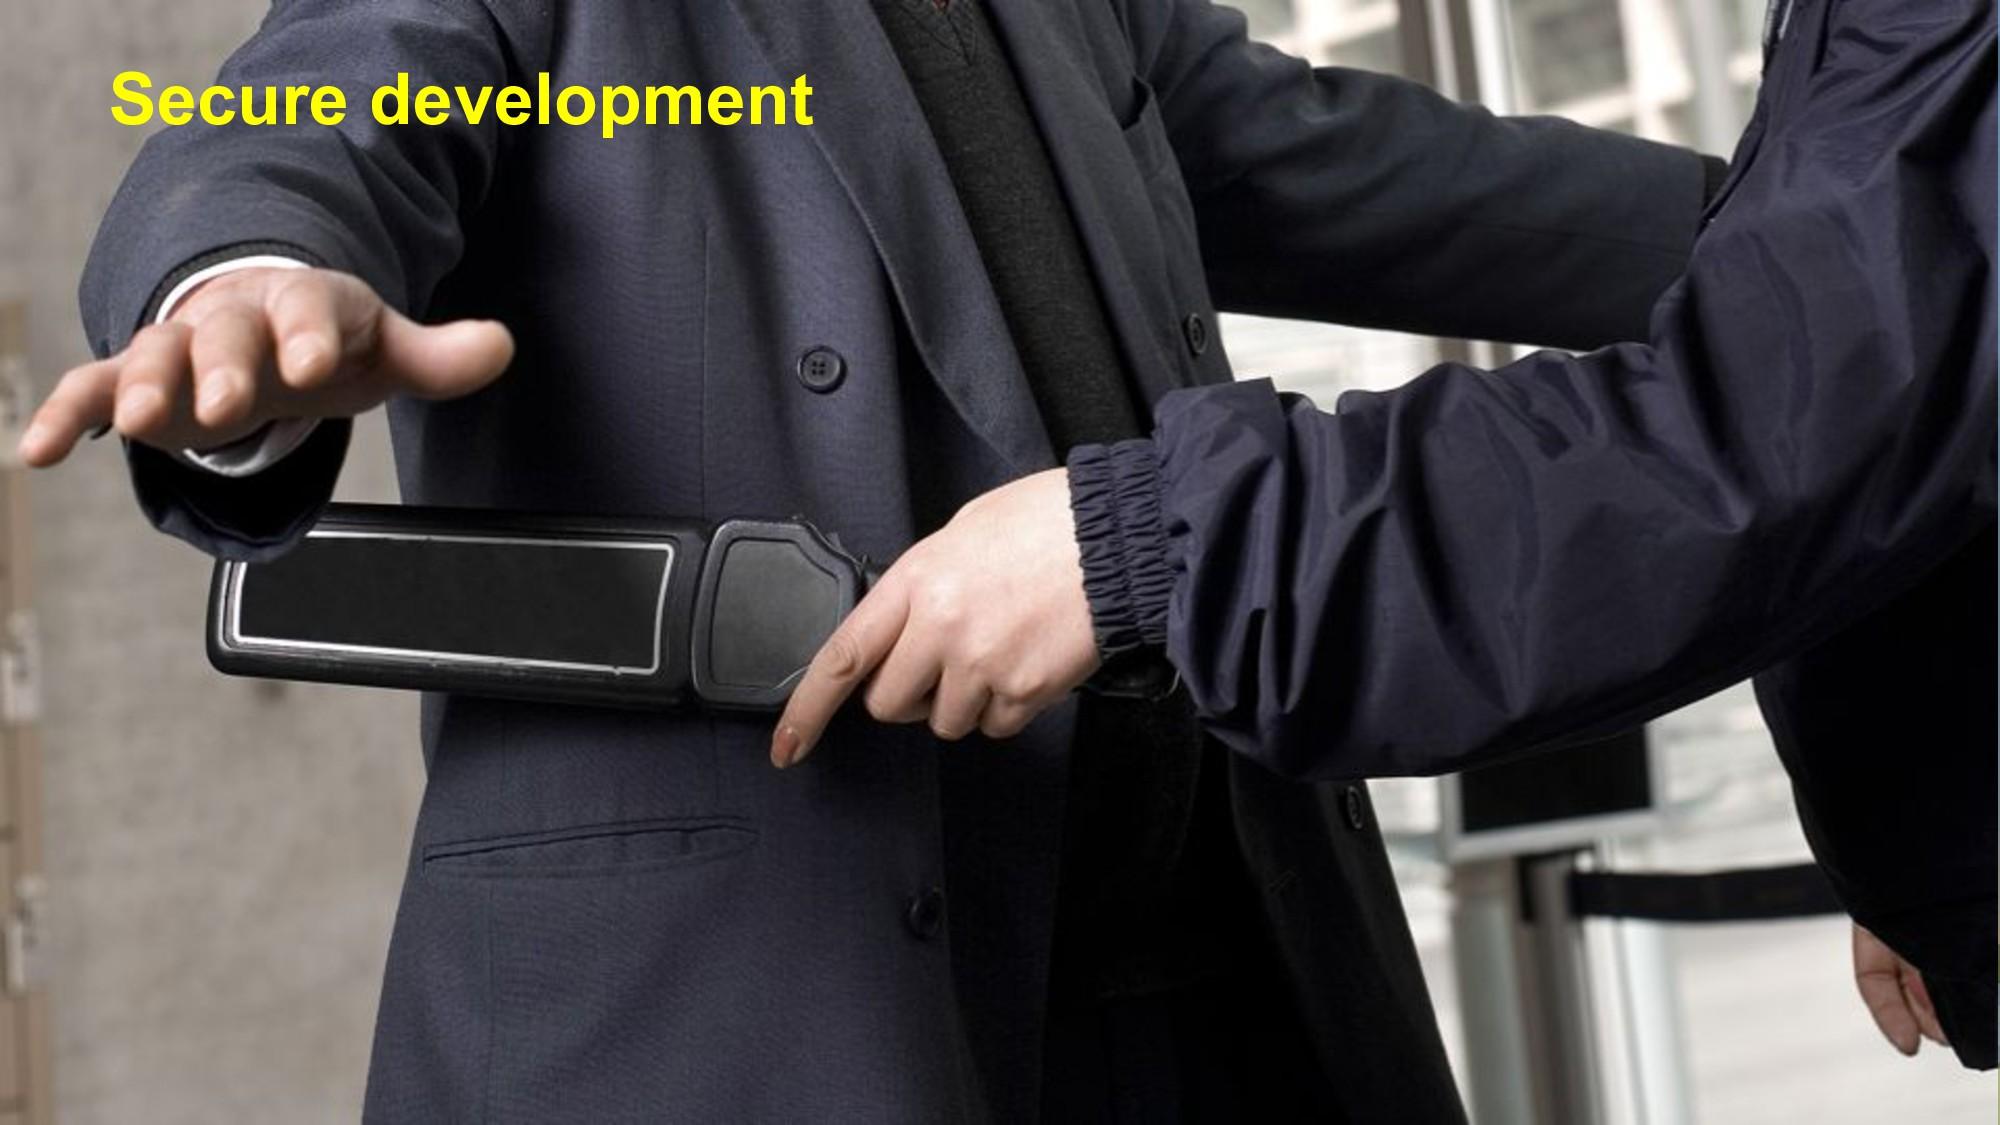 Secure development